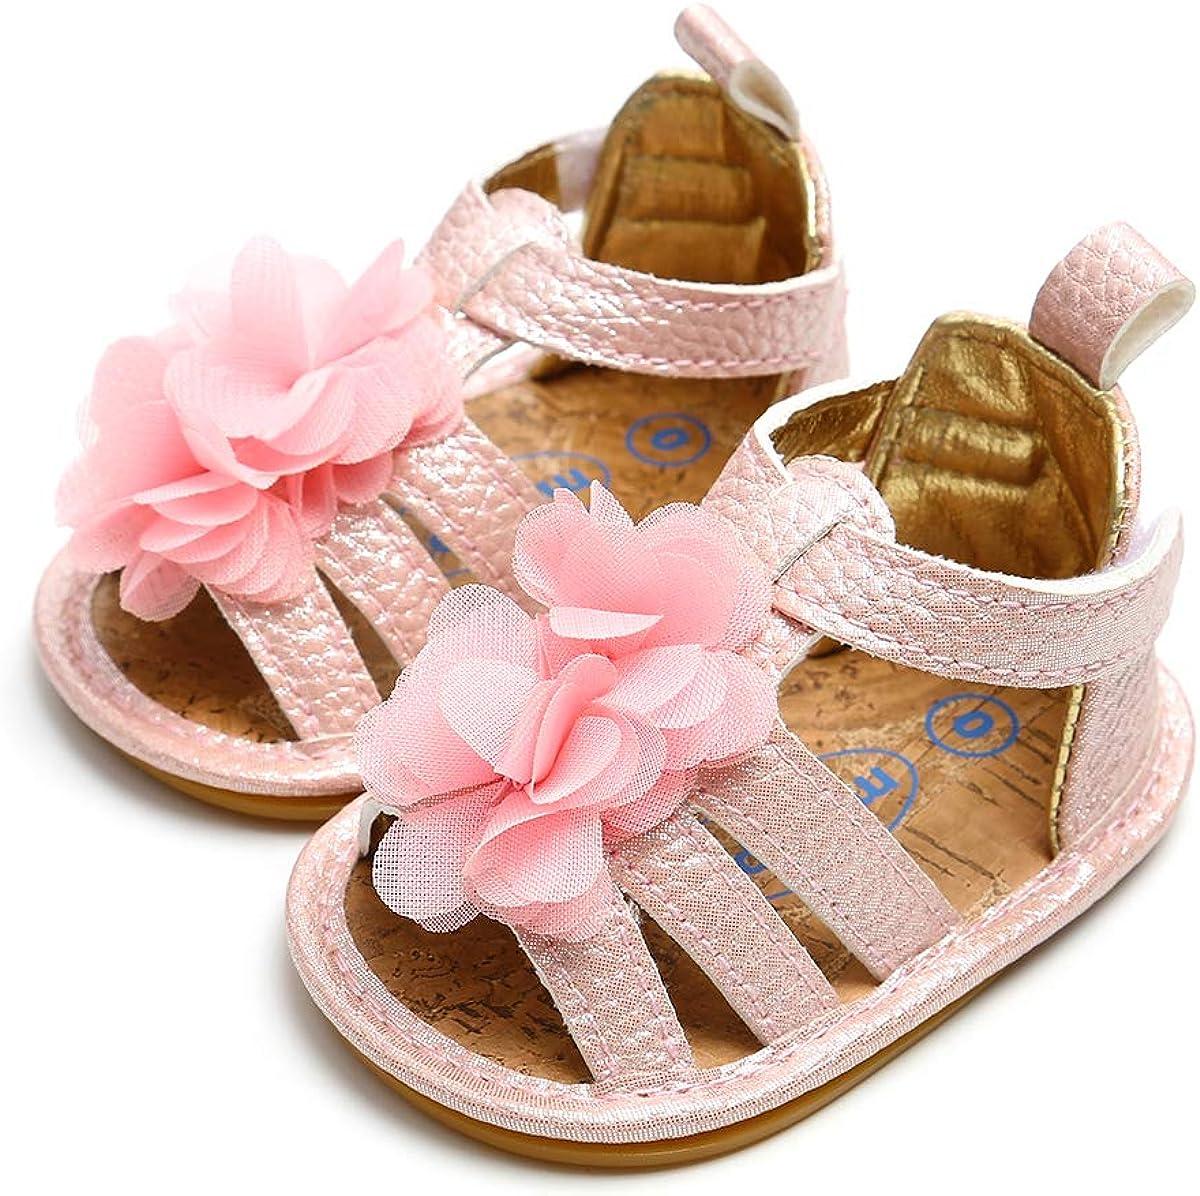 Babelvit Premium Baby Girls Sandals Flower Dress Shoe Soft Closed Toe Infant Toddler Princess Flats First Walkers Shoes